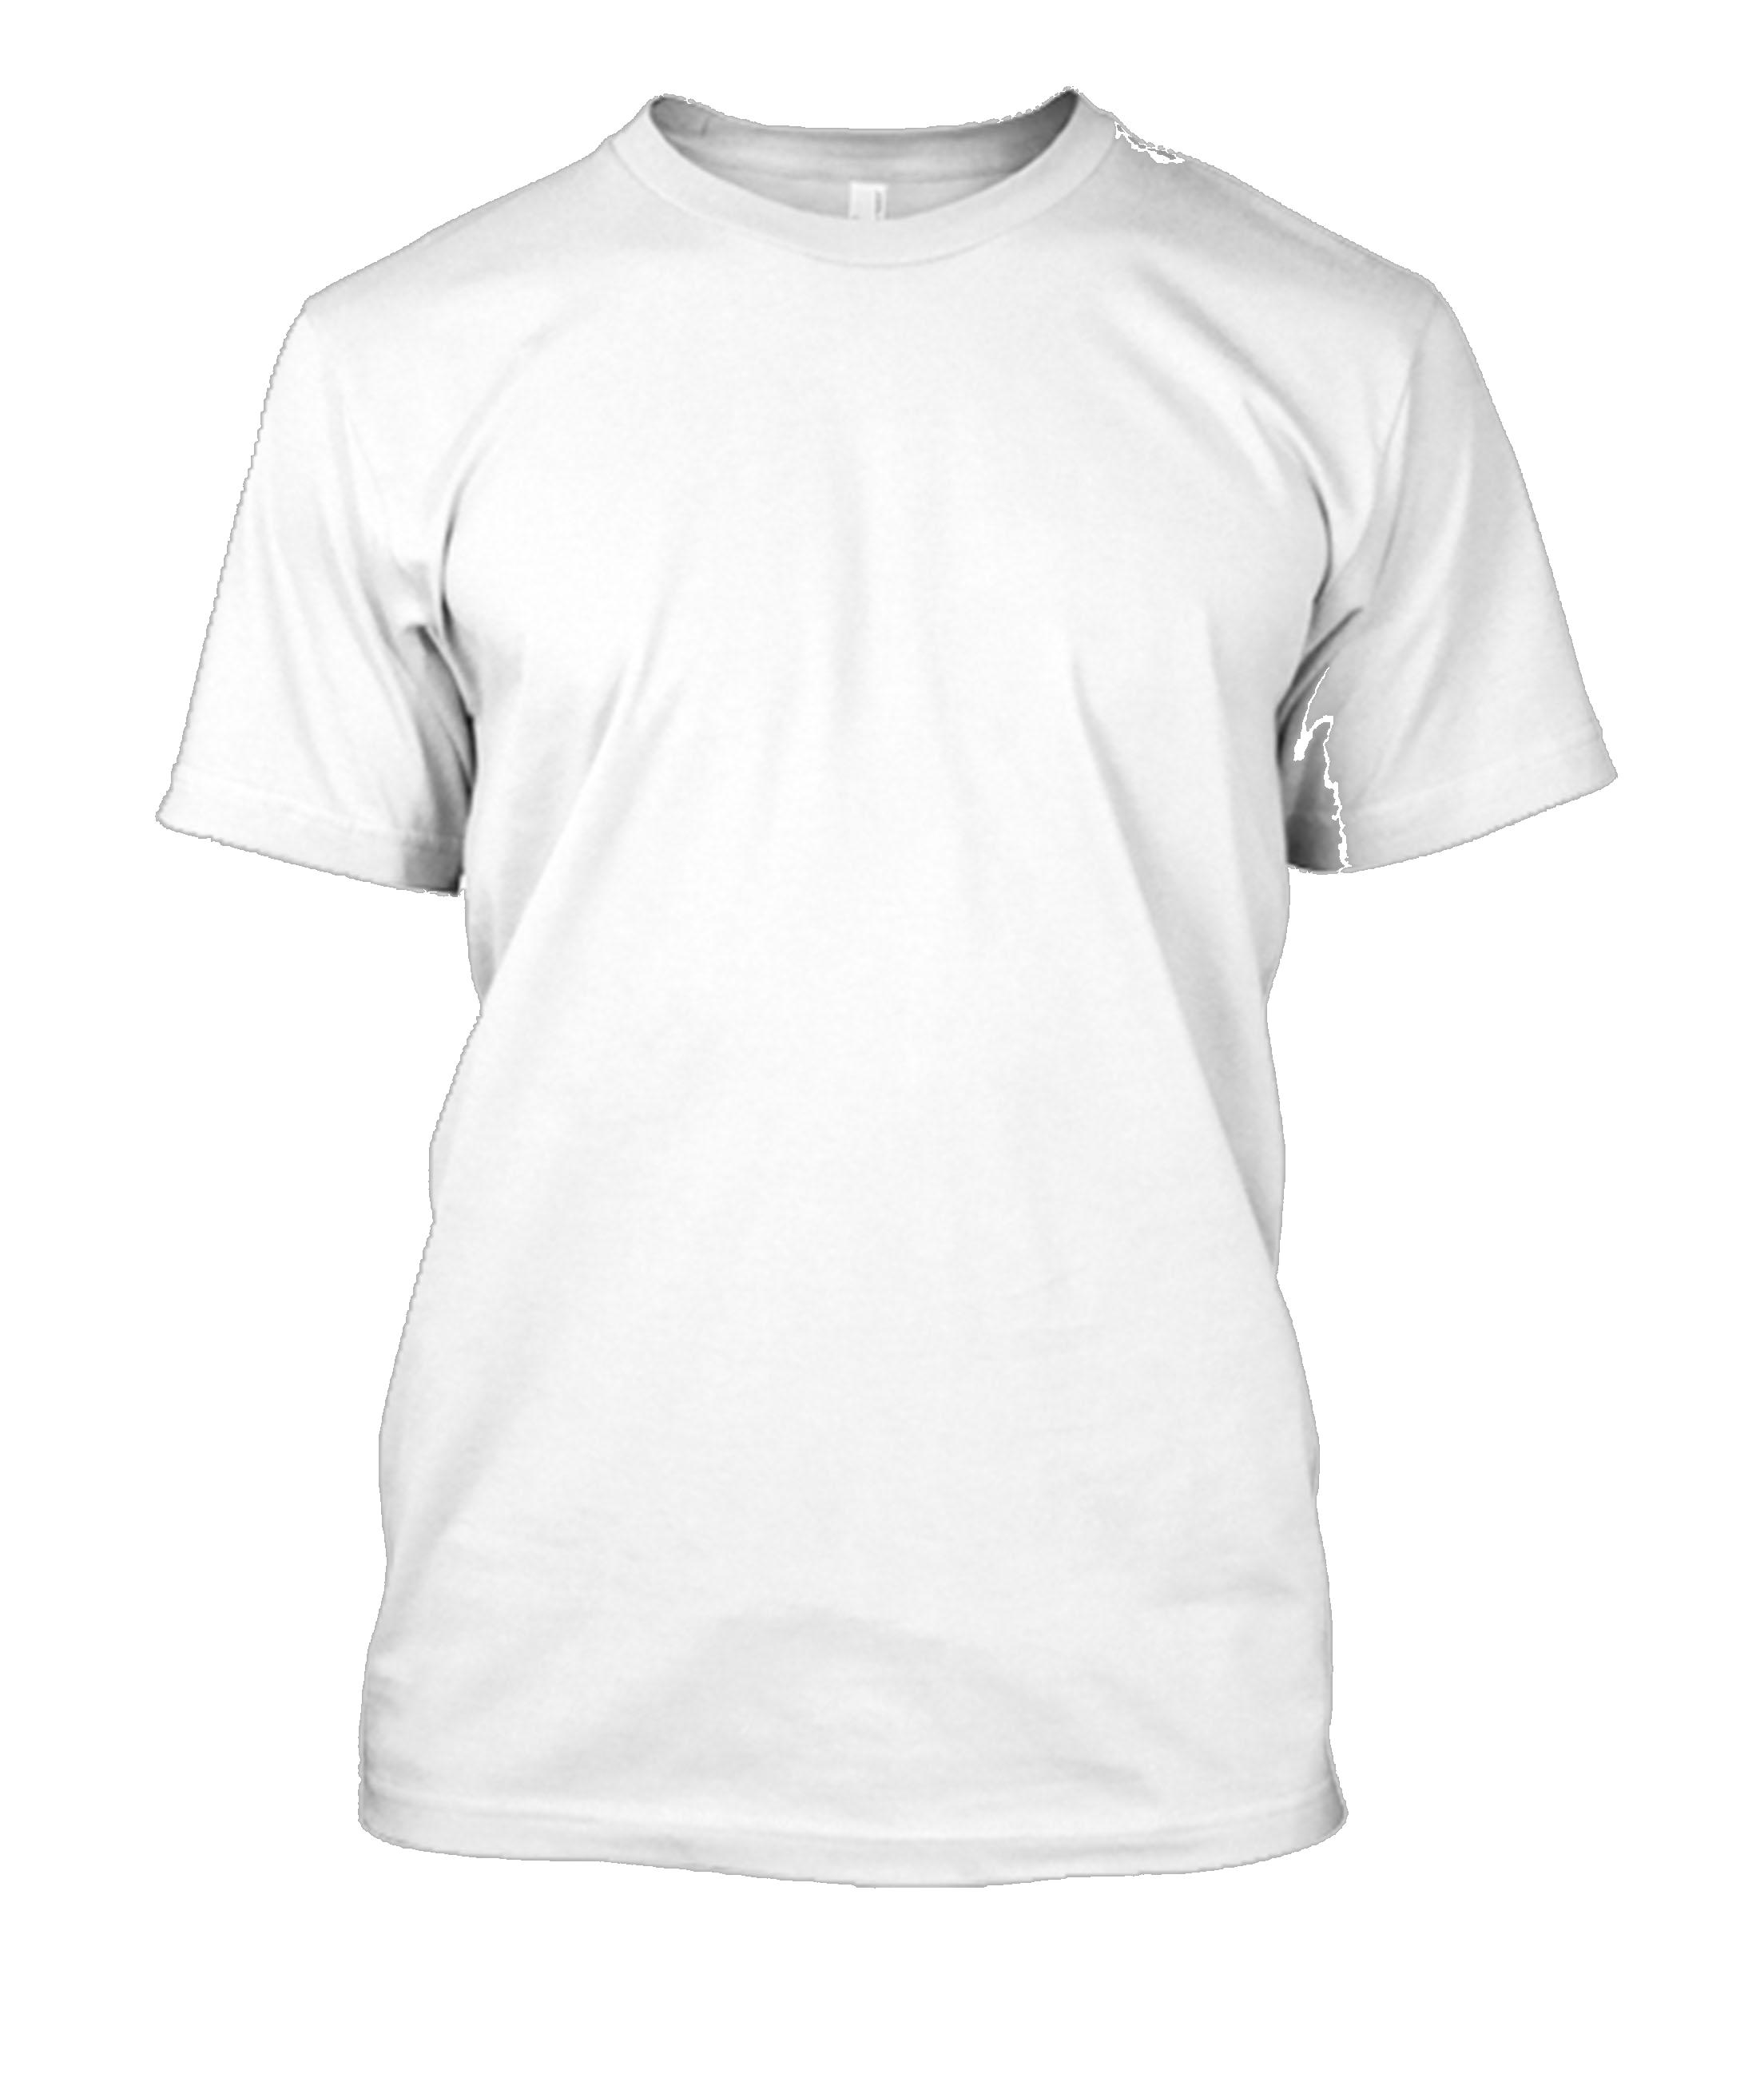 white shirt front